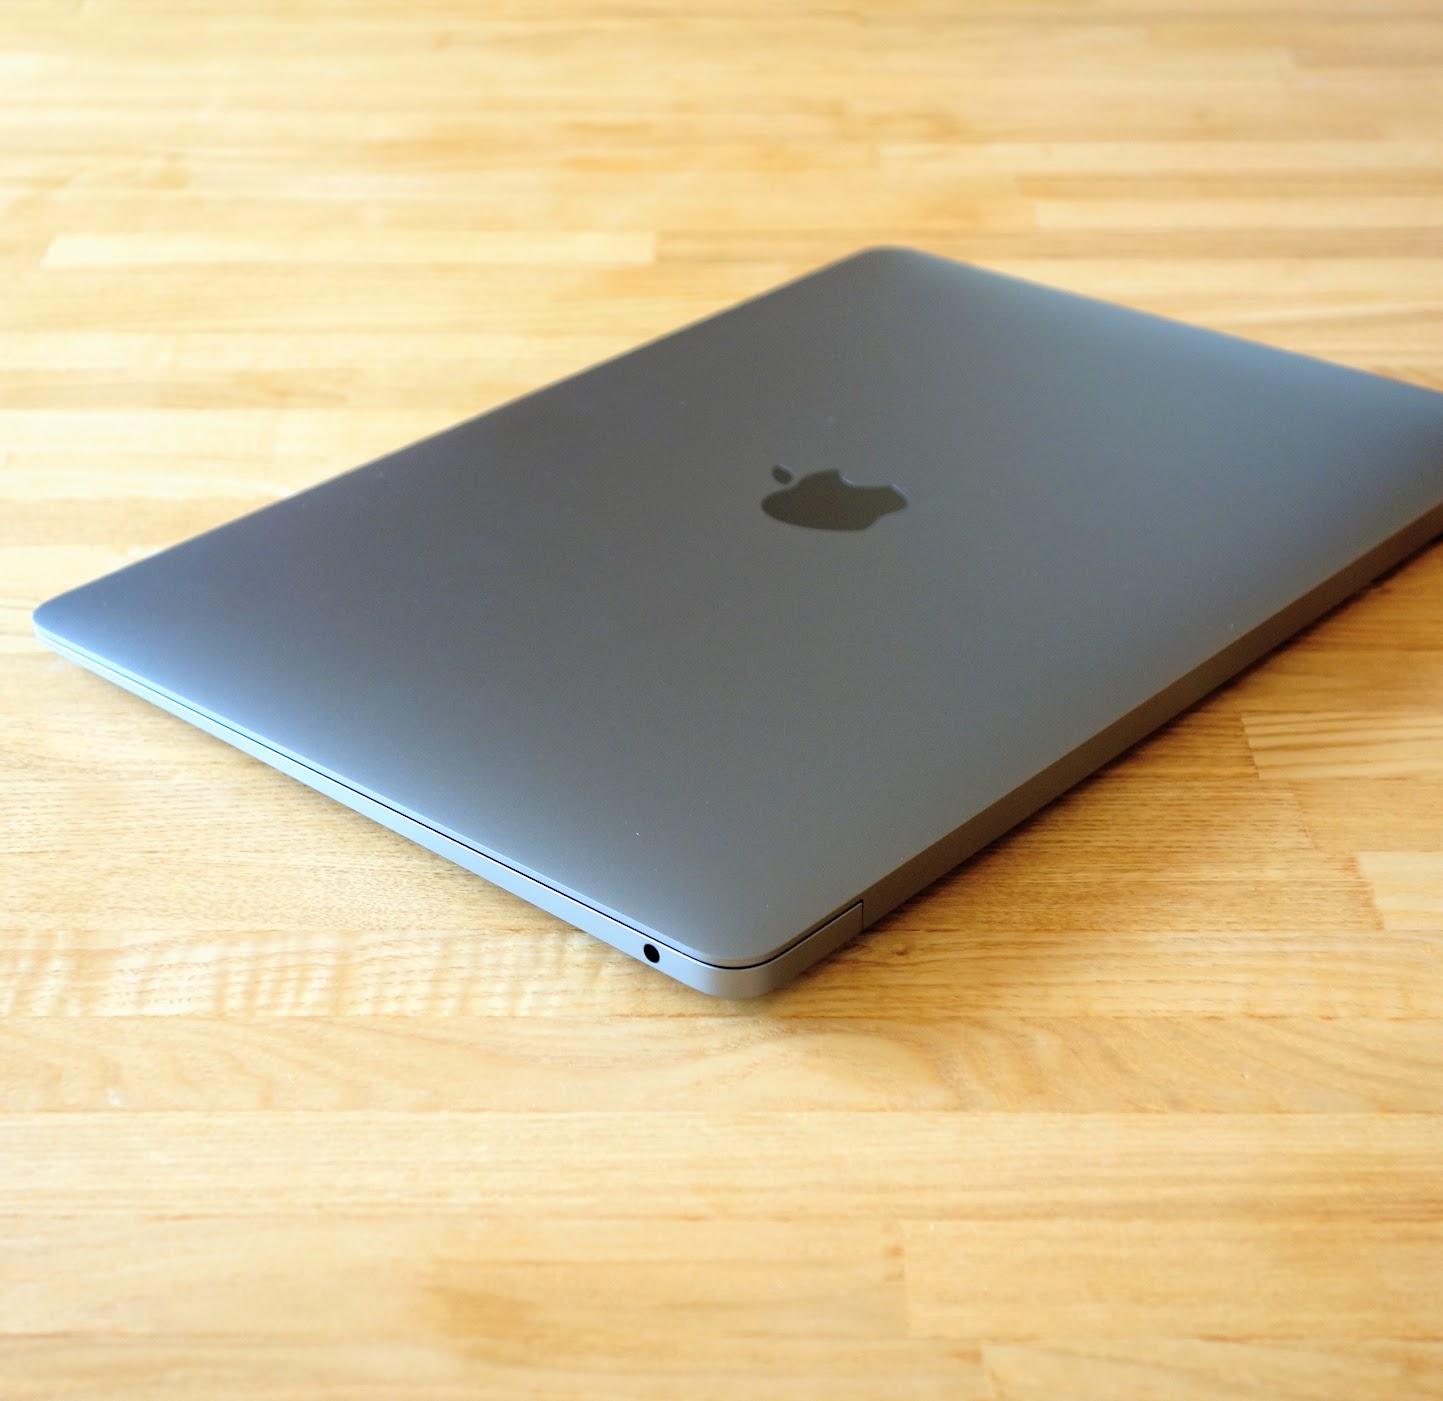 MacBook Air 2020外観斜め後ろ